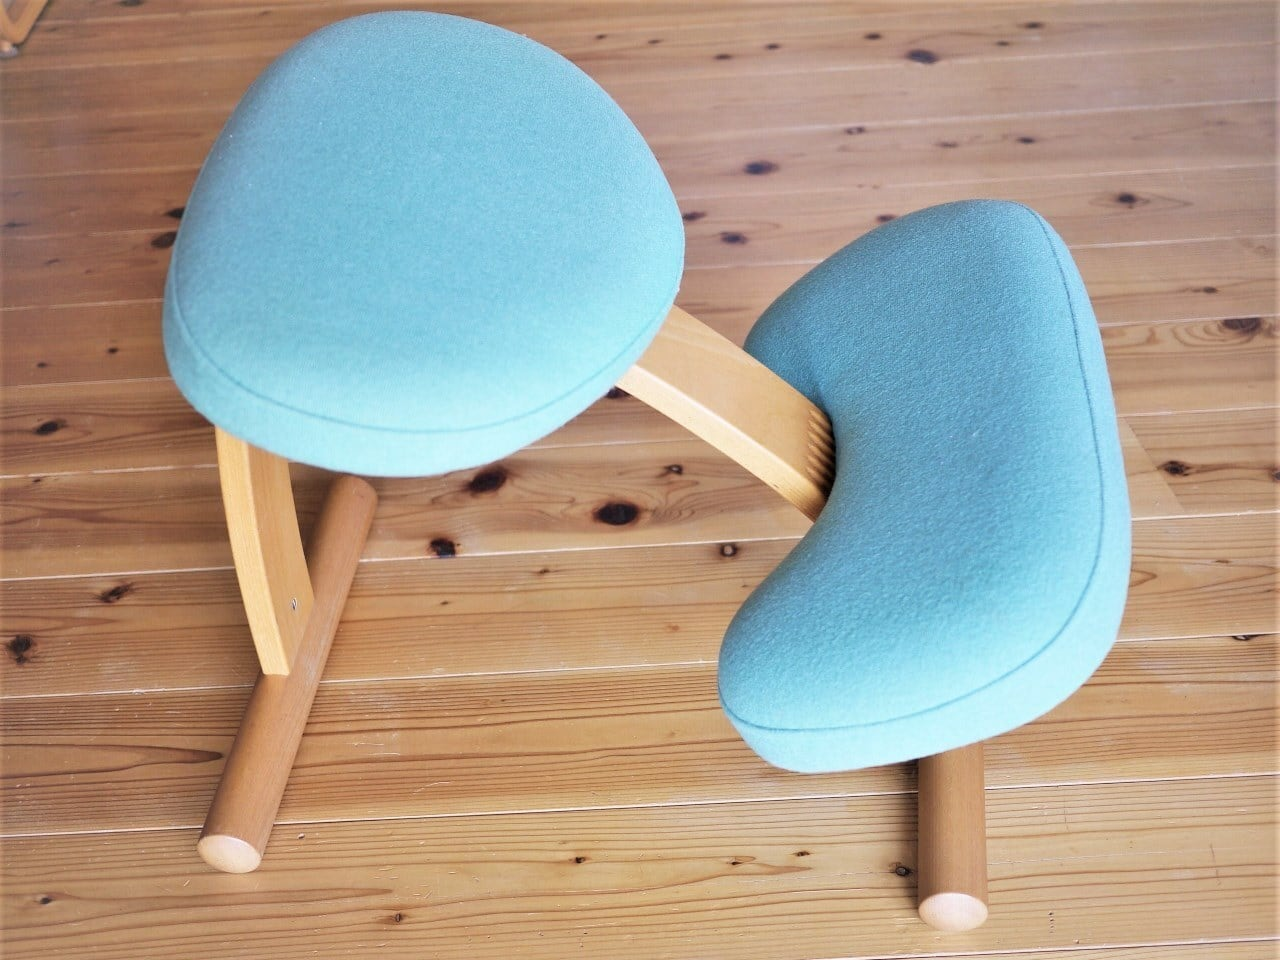 Rybo バランス EASY 北欧ノルウェー ニーリングチェア ブナ材椅子